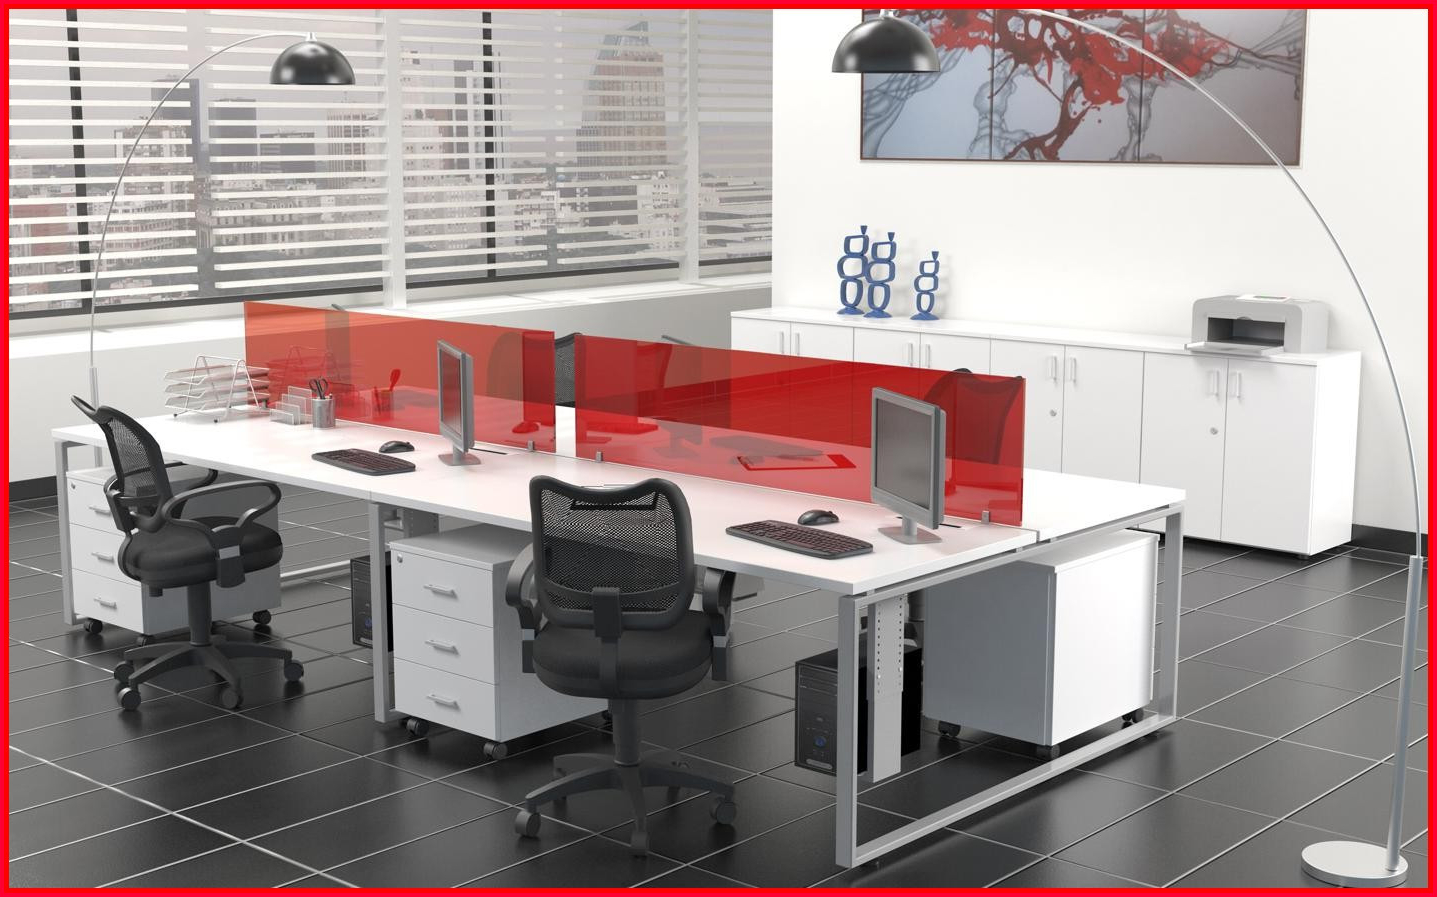 Mobiliario De Oficina Malaga 3ldq Lujo Muebles Oficina Malaga Imagen De Muebles Estilo